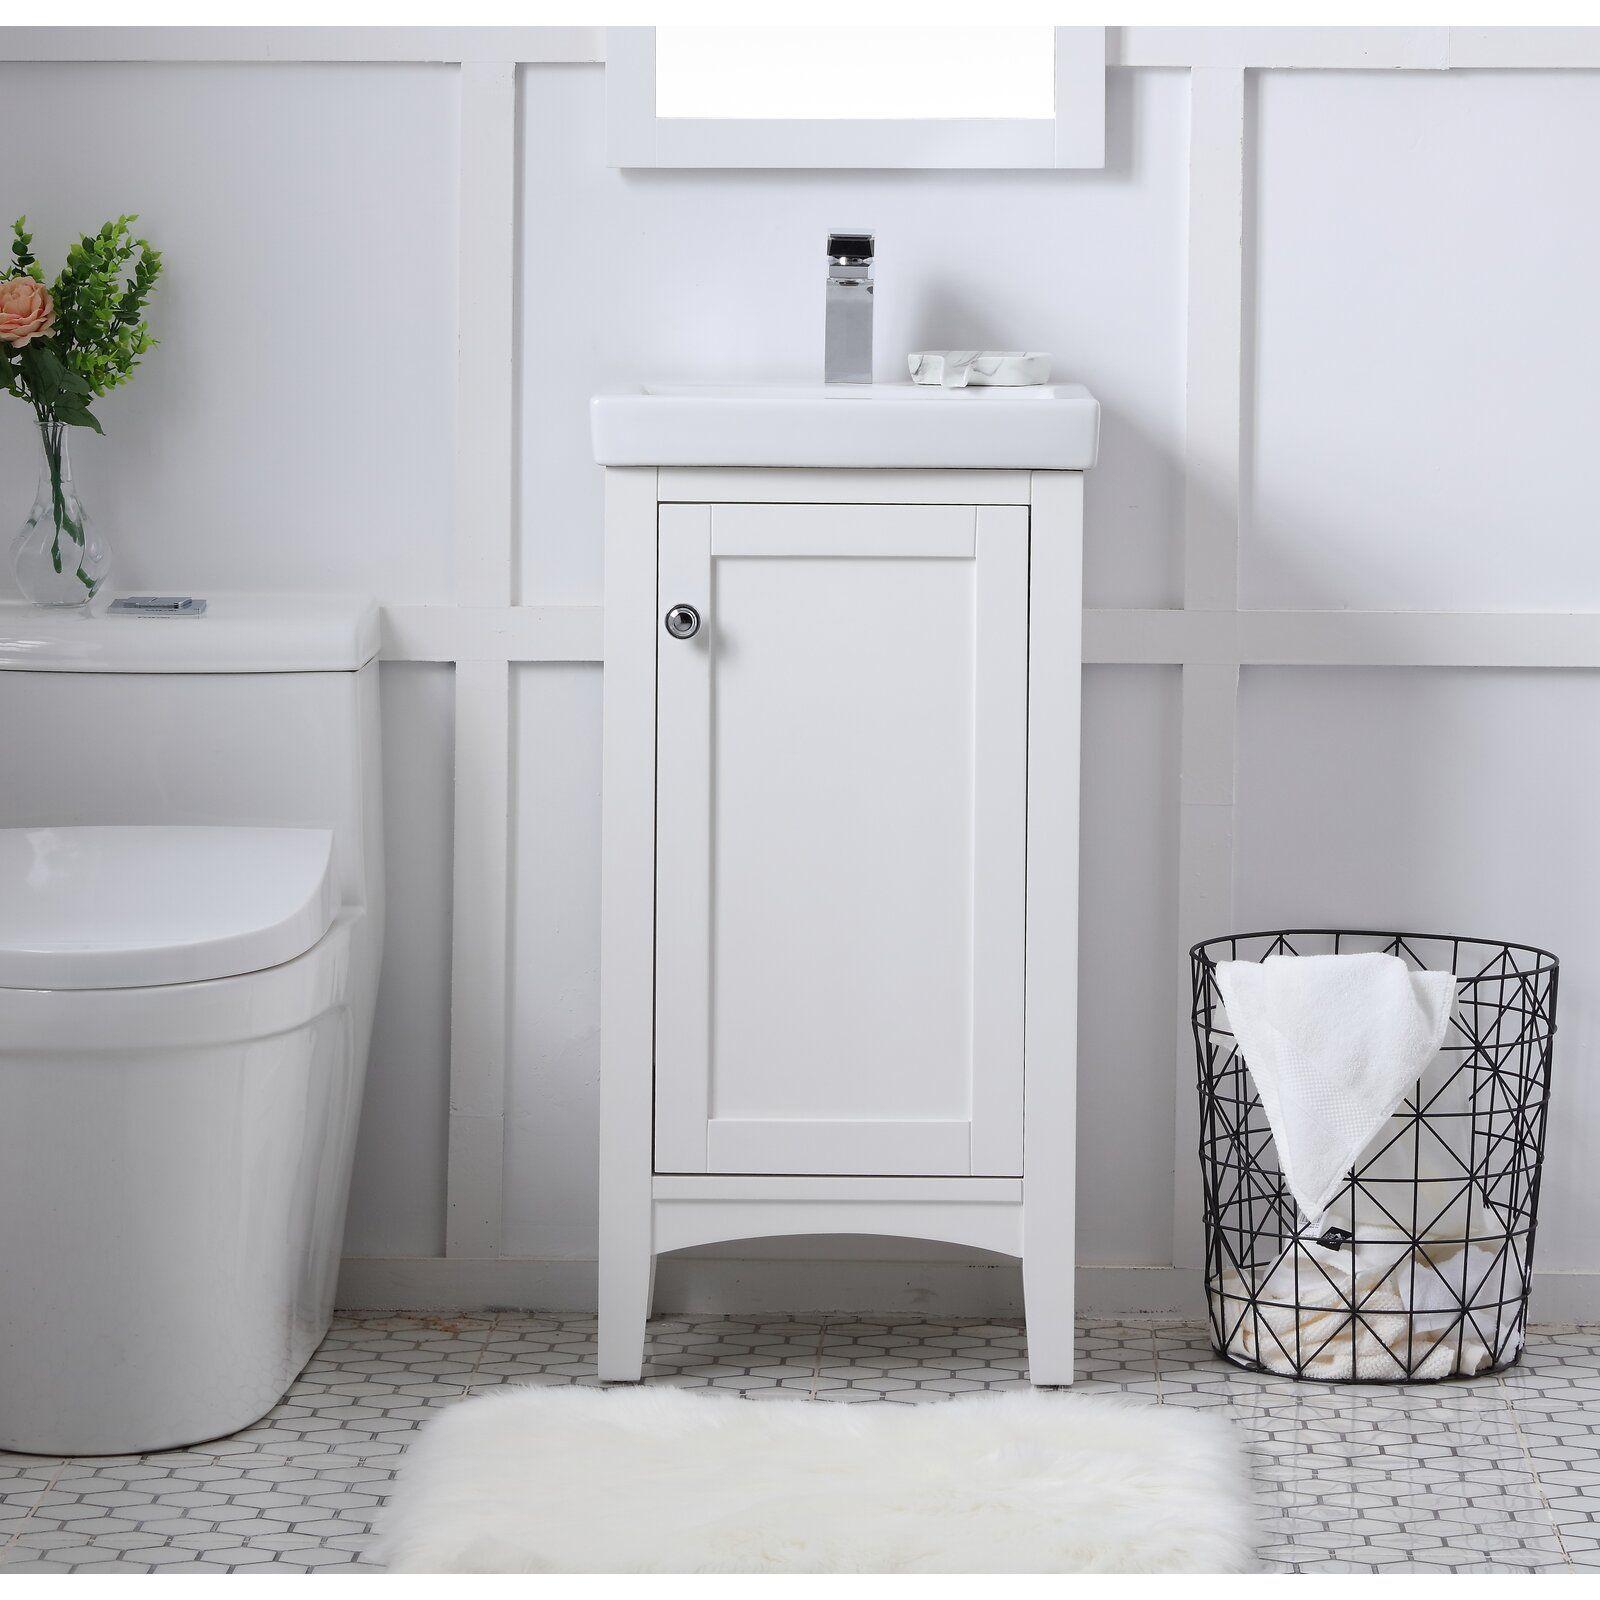 Aramis 18 Single Bathroom Vanity Set Small Bathroom Vanities Single Bathroom Vanity Home Depot Bathroom Vanity [ 1600 x 1600 Pixel ]